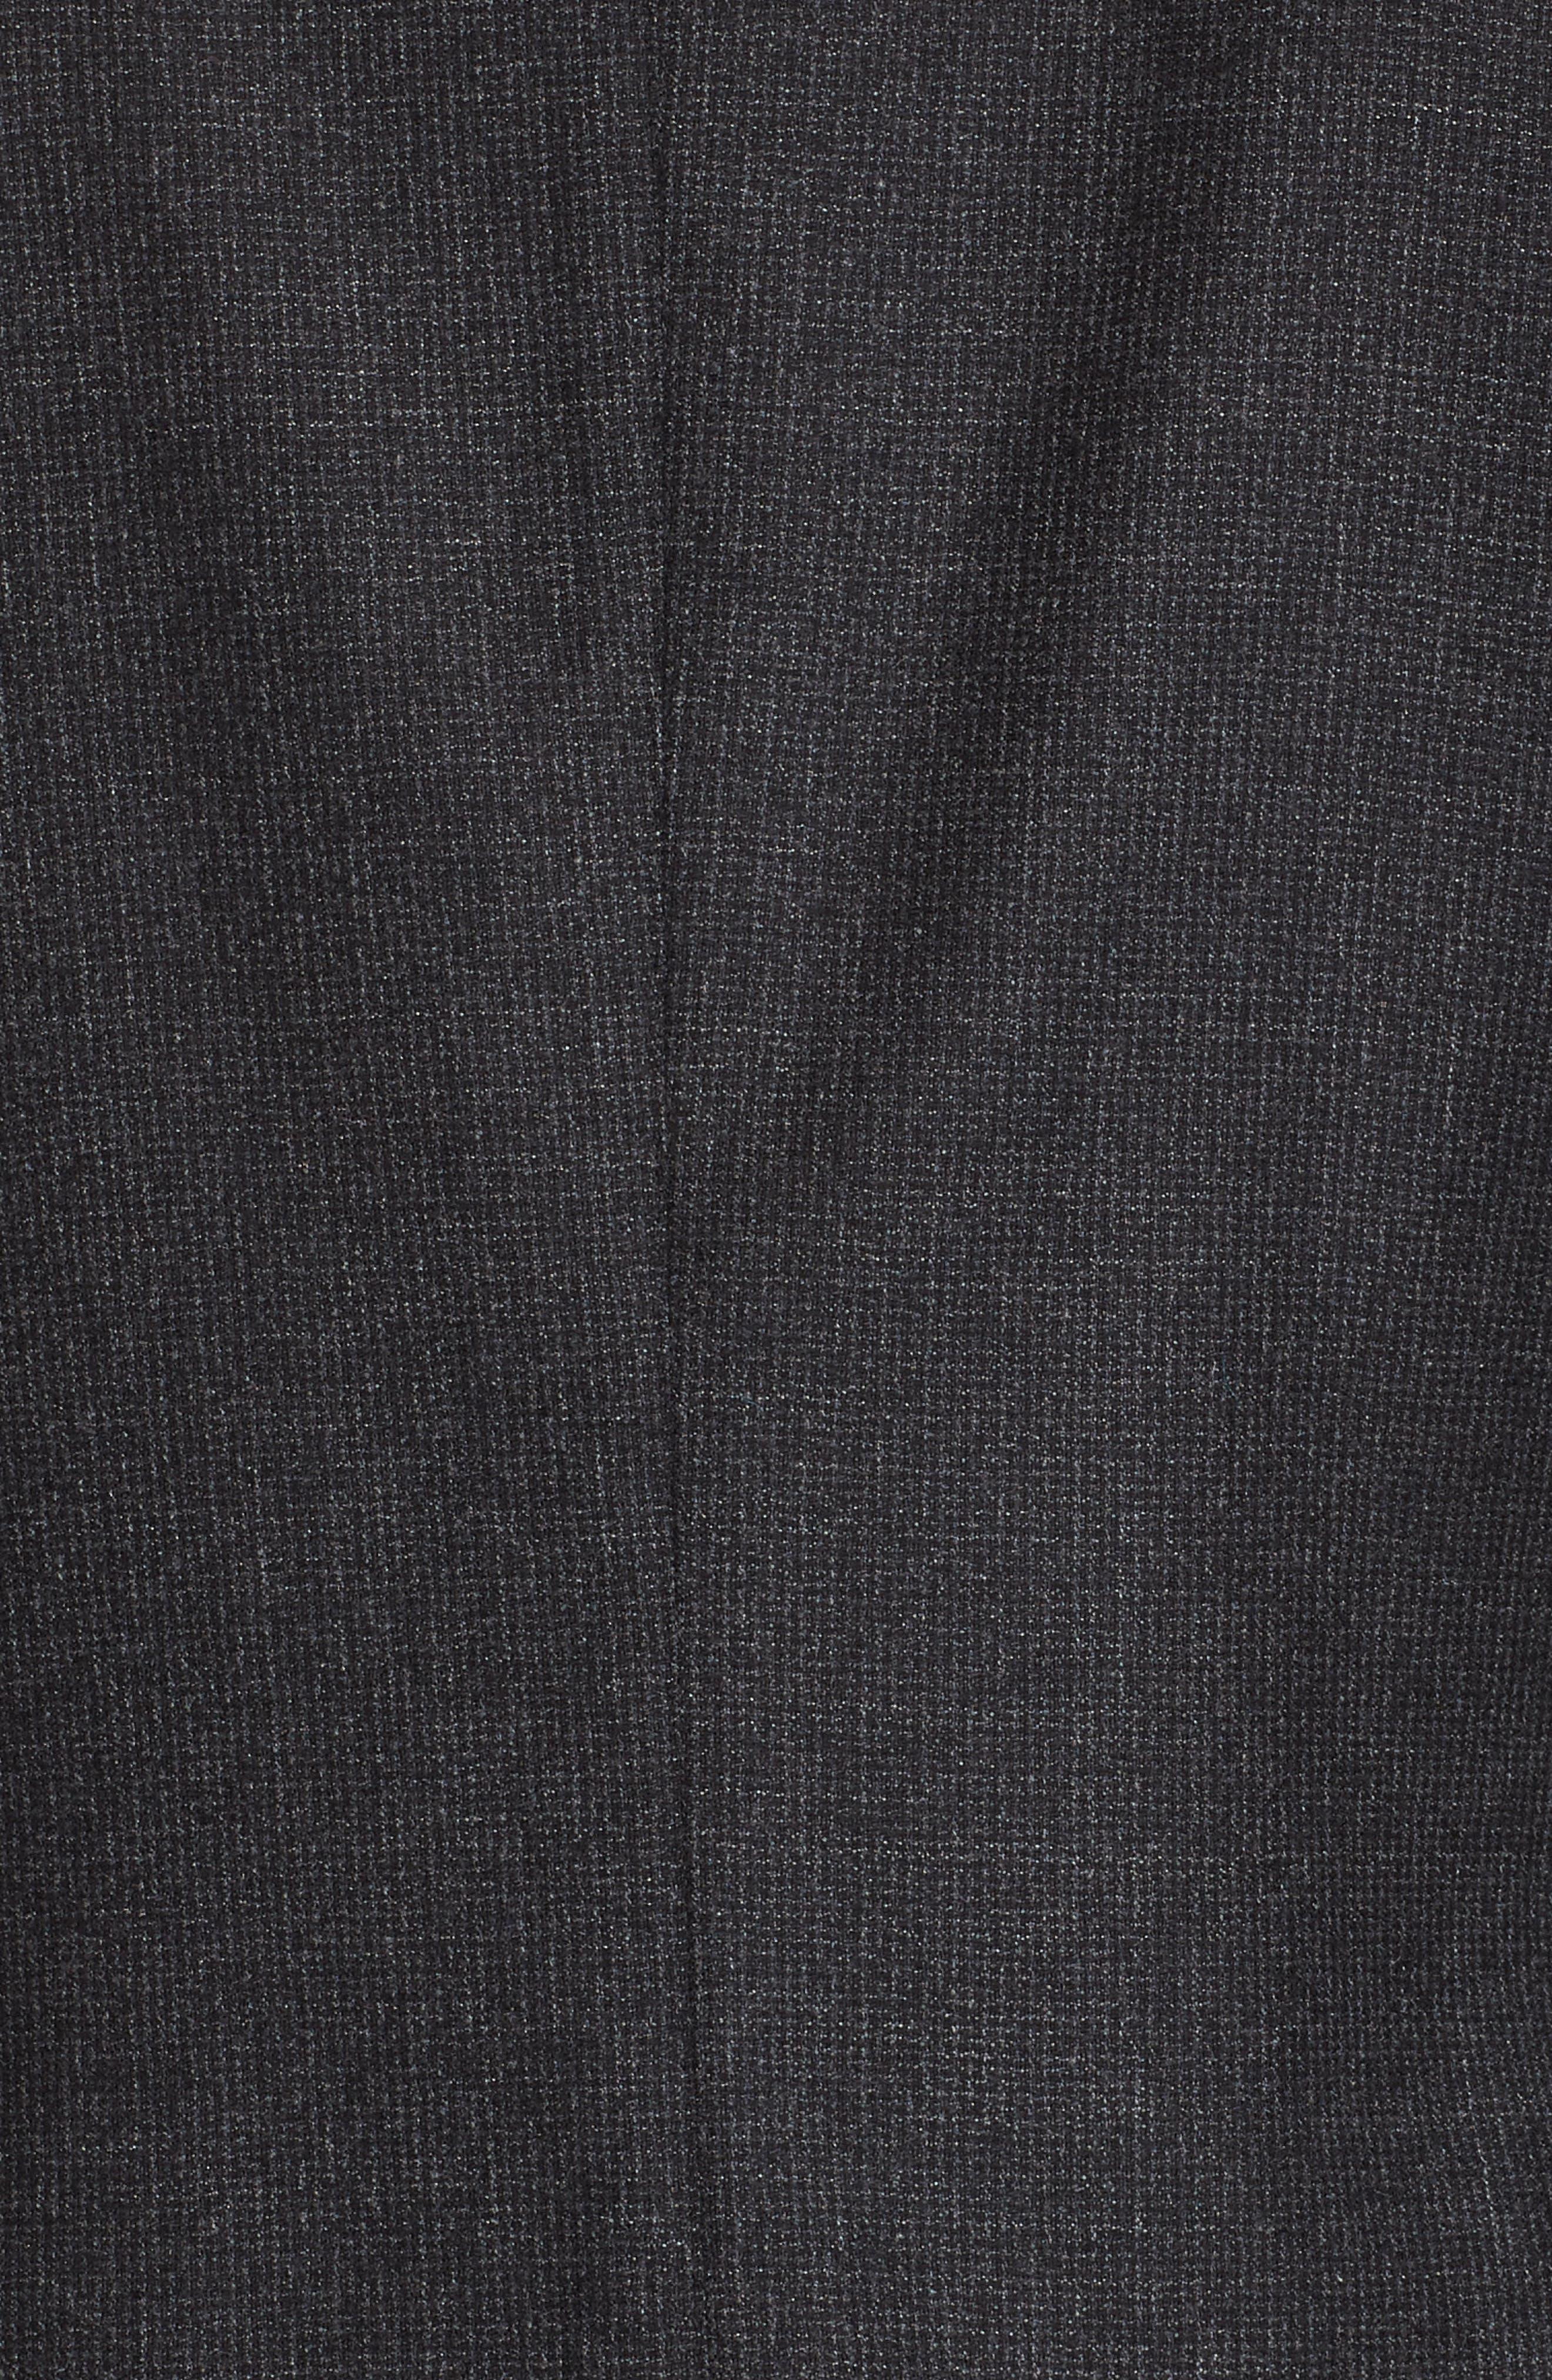 Trim Fit Wash & Go Solid Wool Suit,                             Alternate thumbnail 7, color,                             GREY